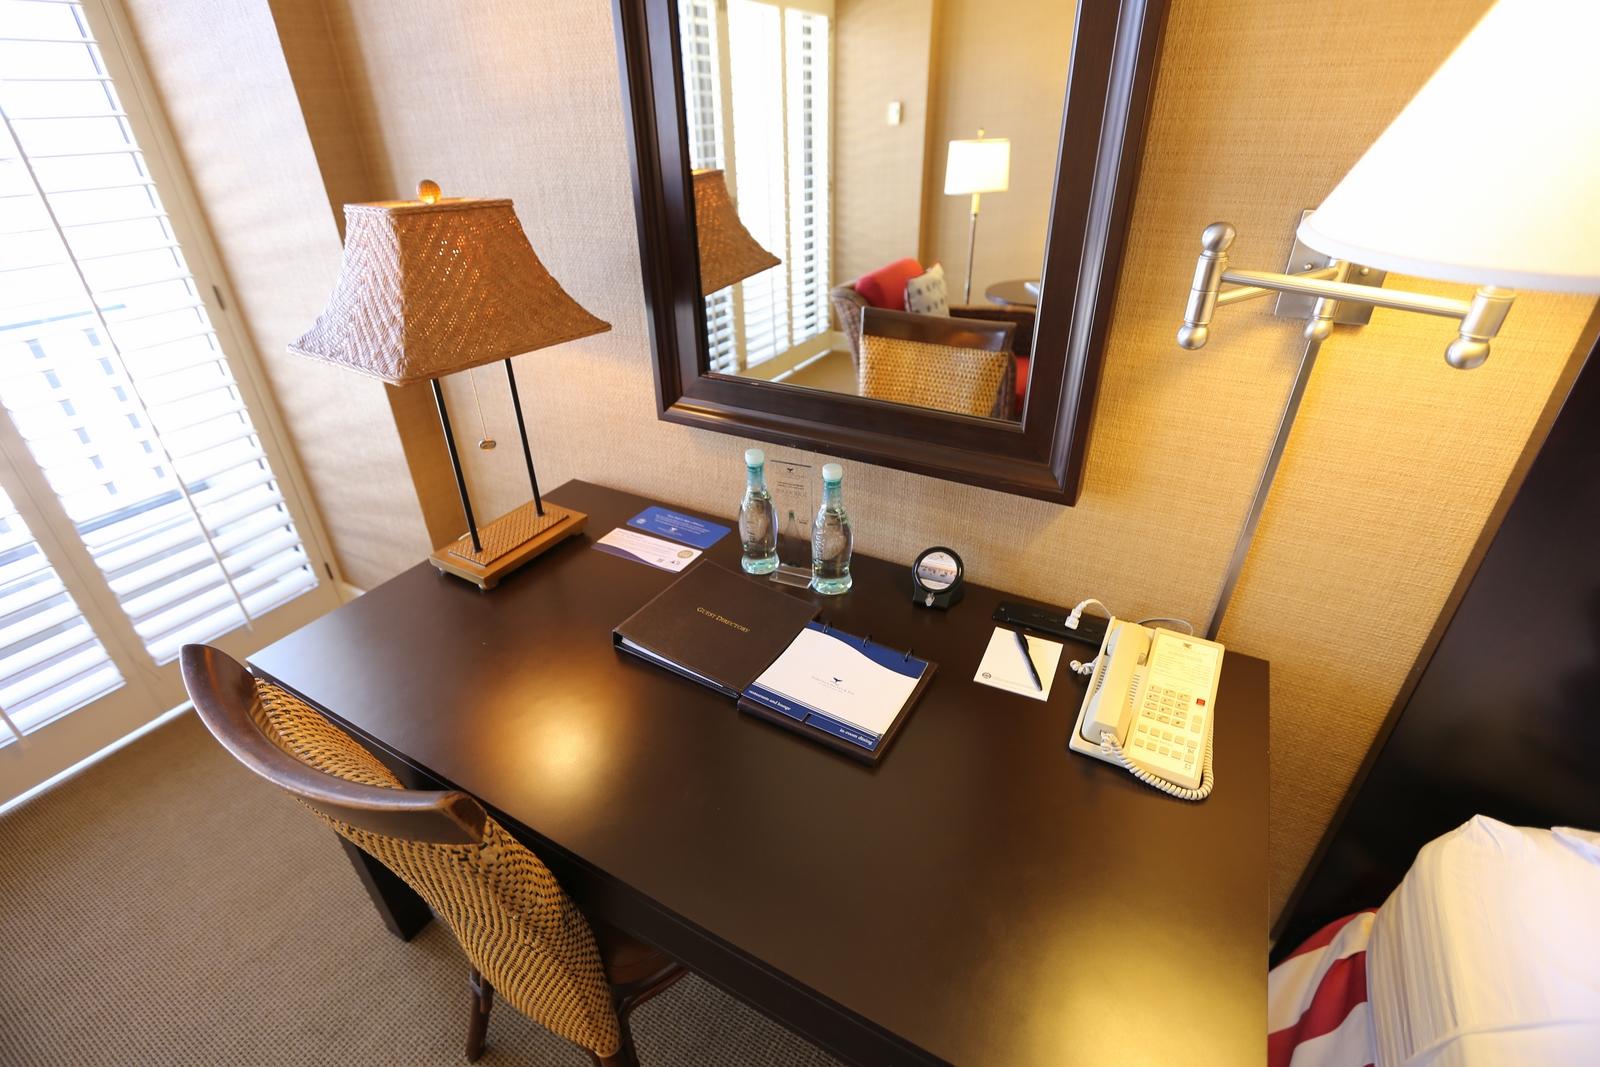 Hotel Resort Review Portola Hotel & Spa at Monterey Bay